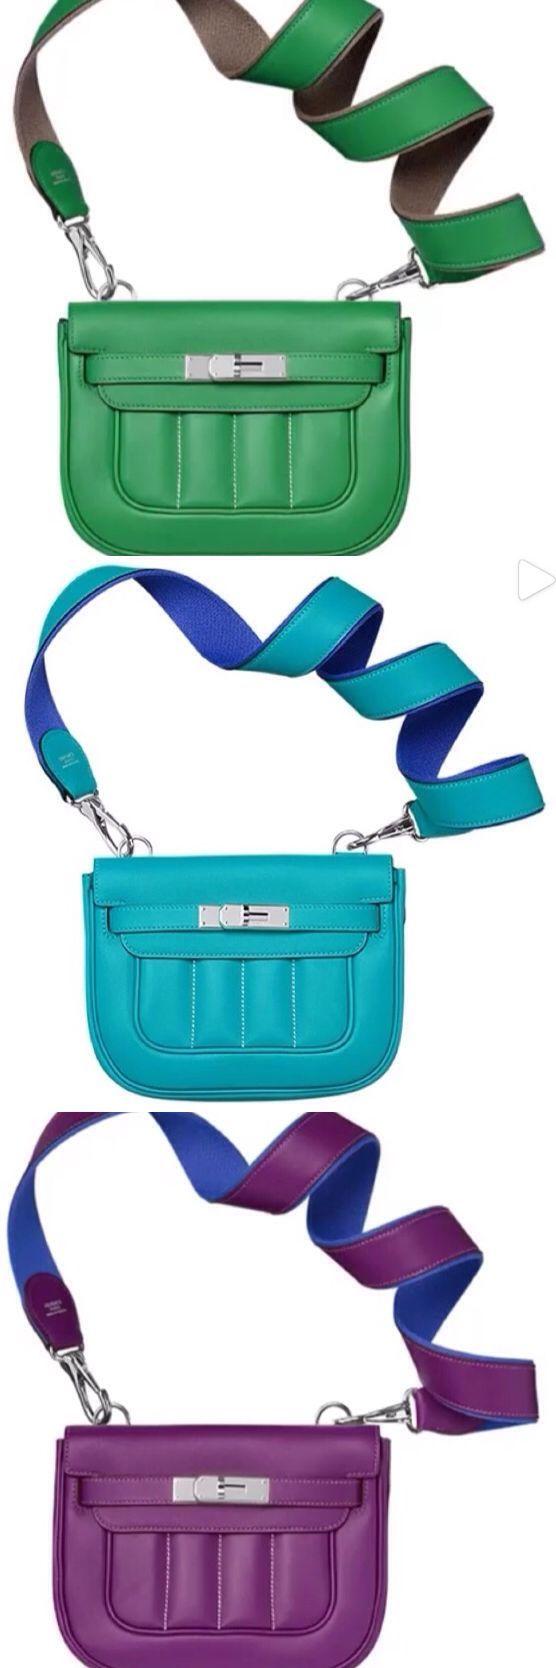 ~Hermes Mini Berline Bag - SS 2015 | Luxurydotcom | House of Beccaria